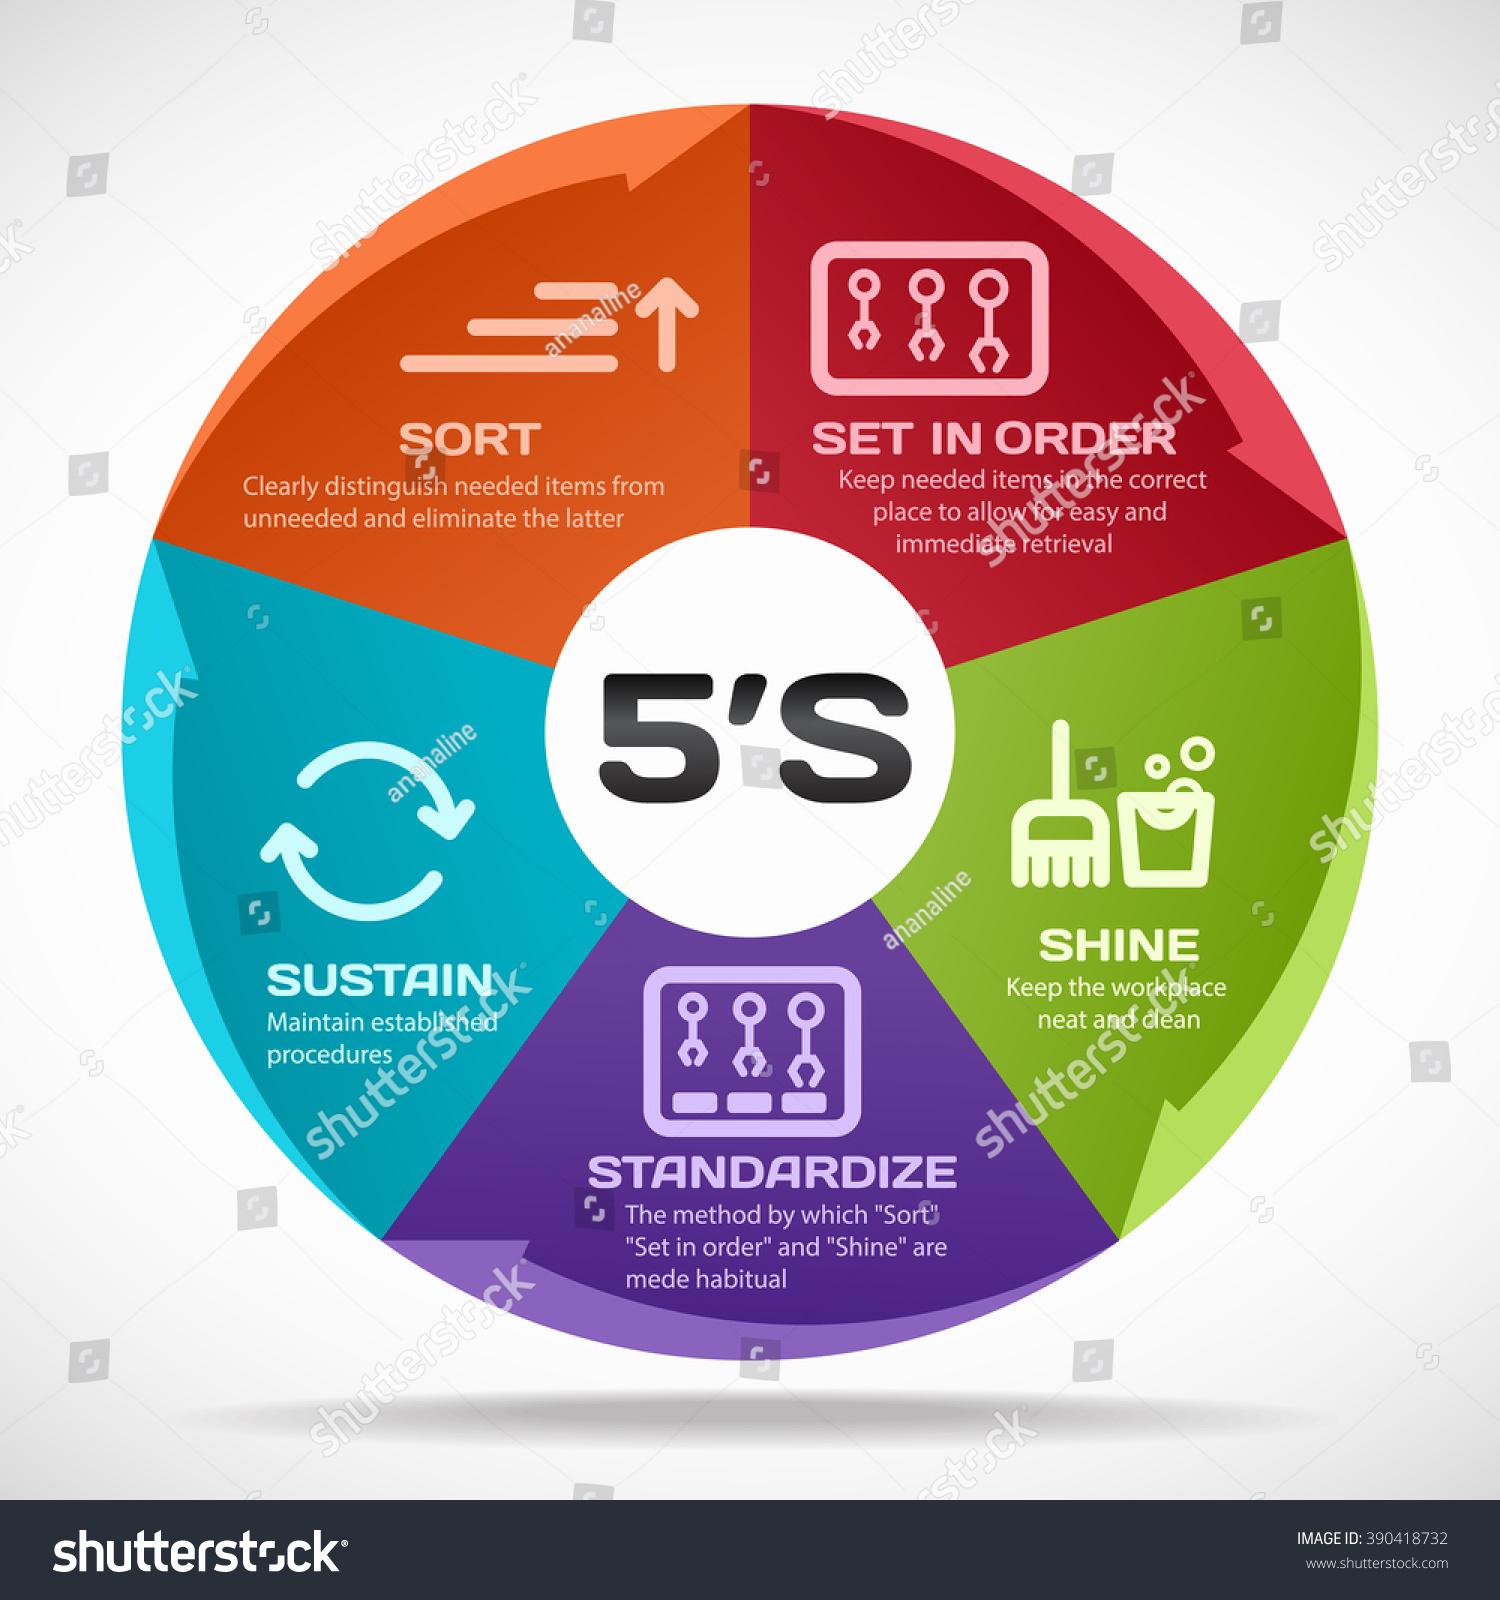 5s poster design - 5s Methodology Management Sort Set In Order Shine Standardize And Sustain